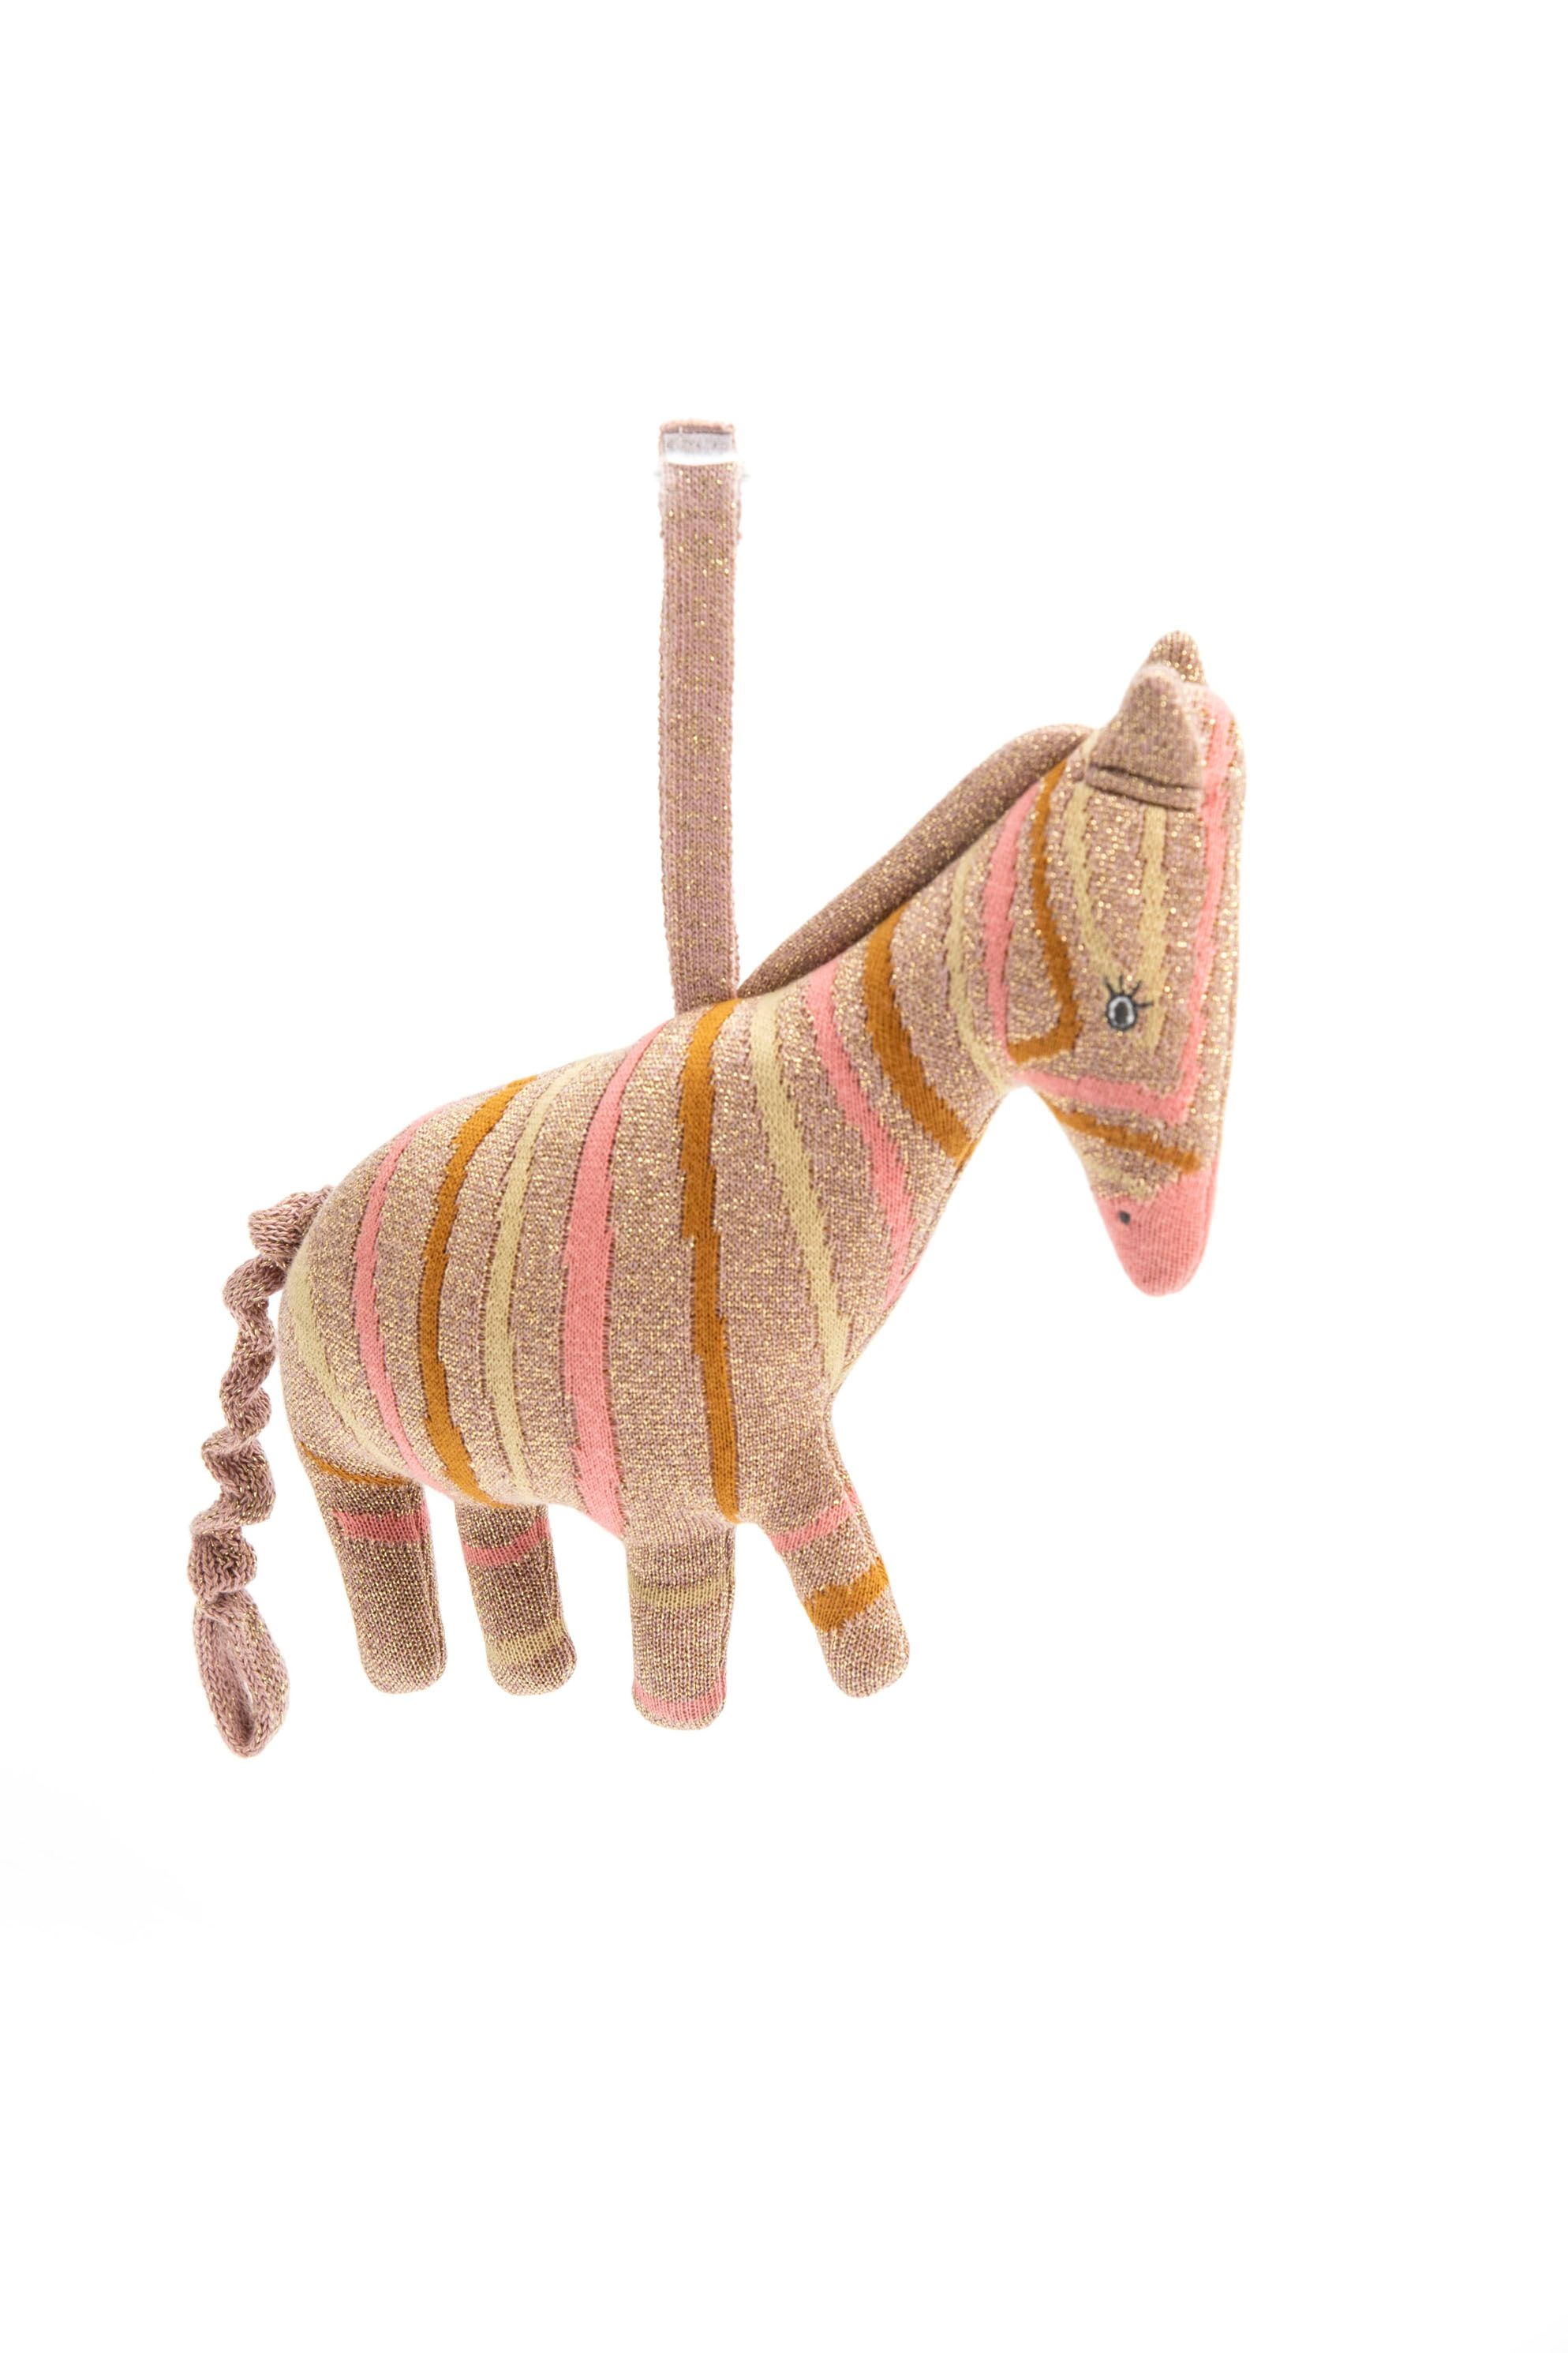 Smallstuff - Crochet Music Mobile - Multi Zebra